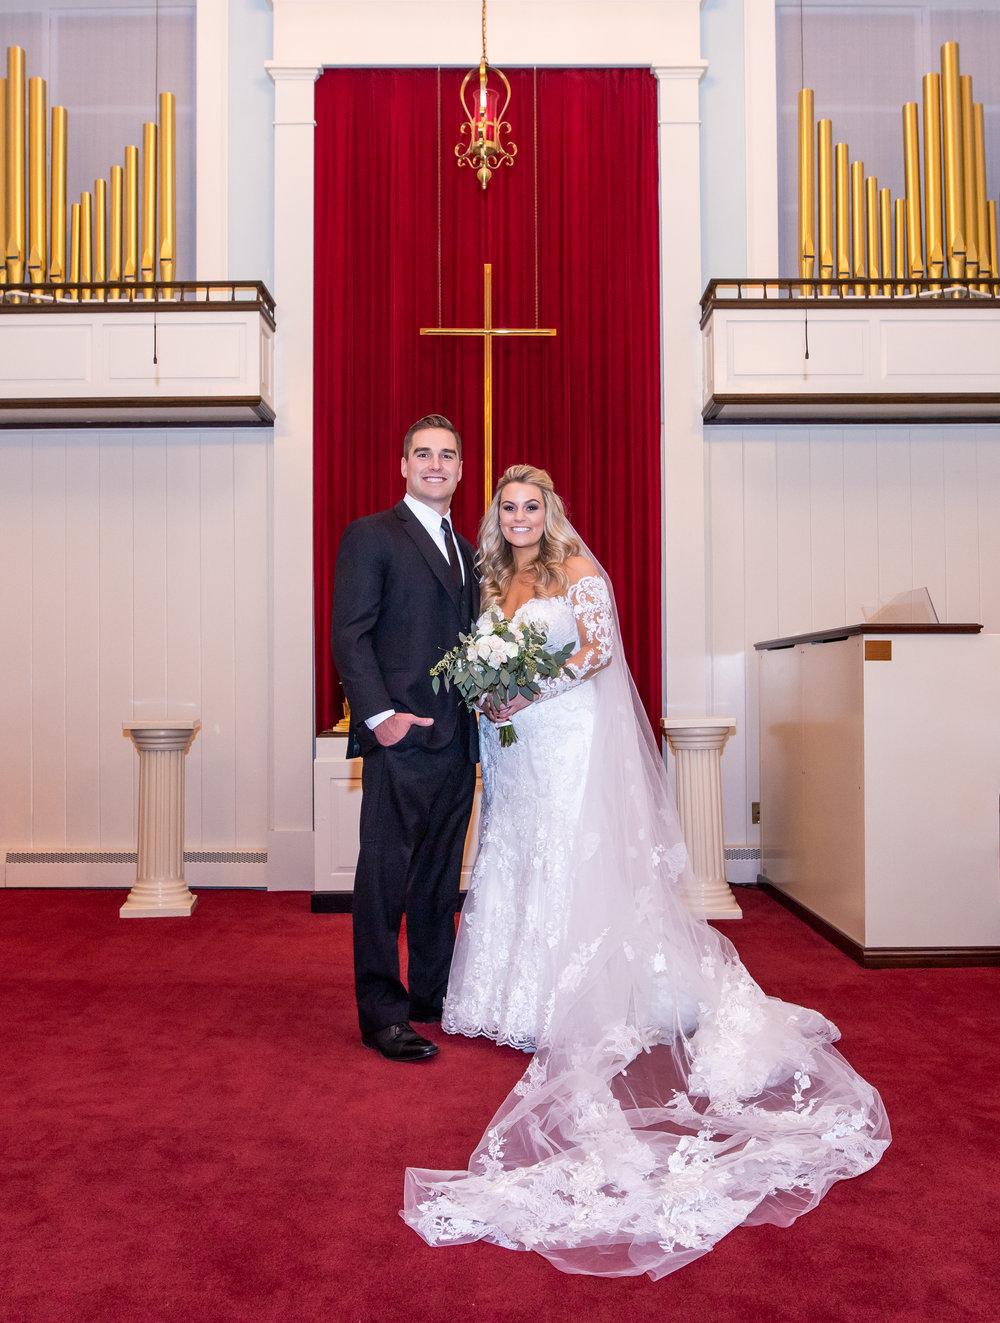 Union Chapel-wedding-photographer-Indianapolis-Indiana.jpg